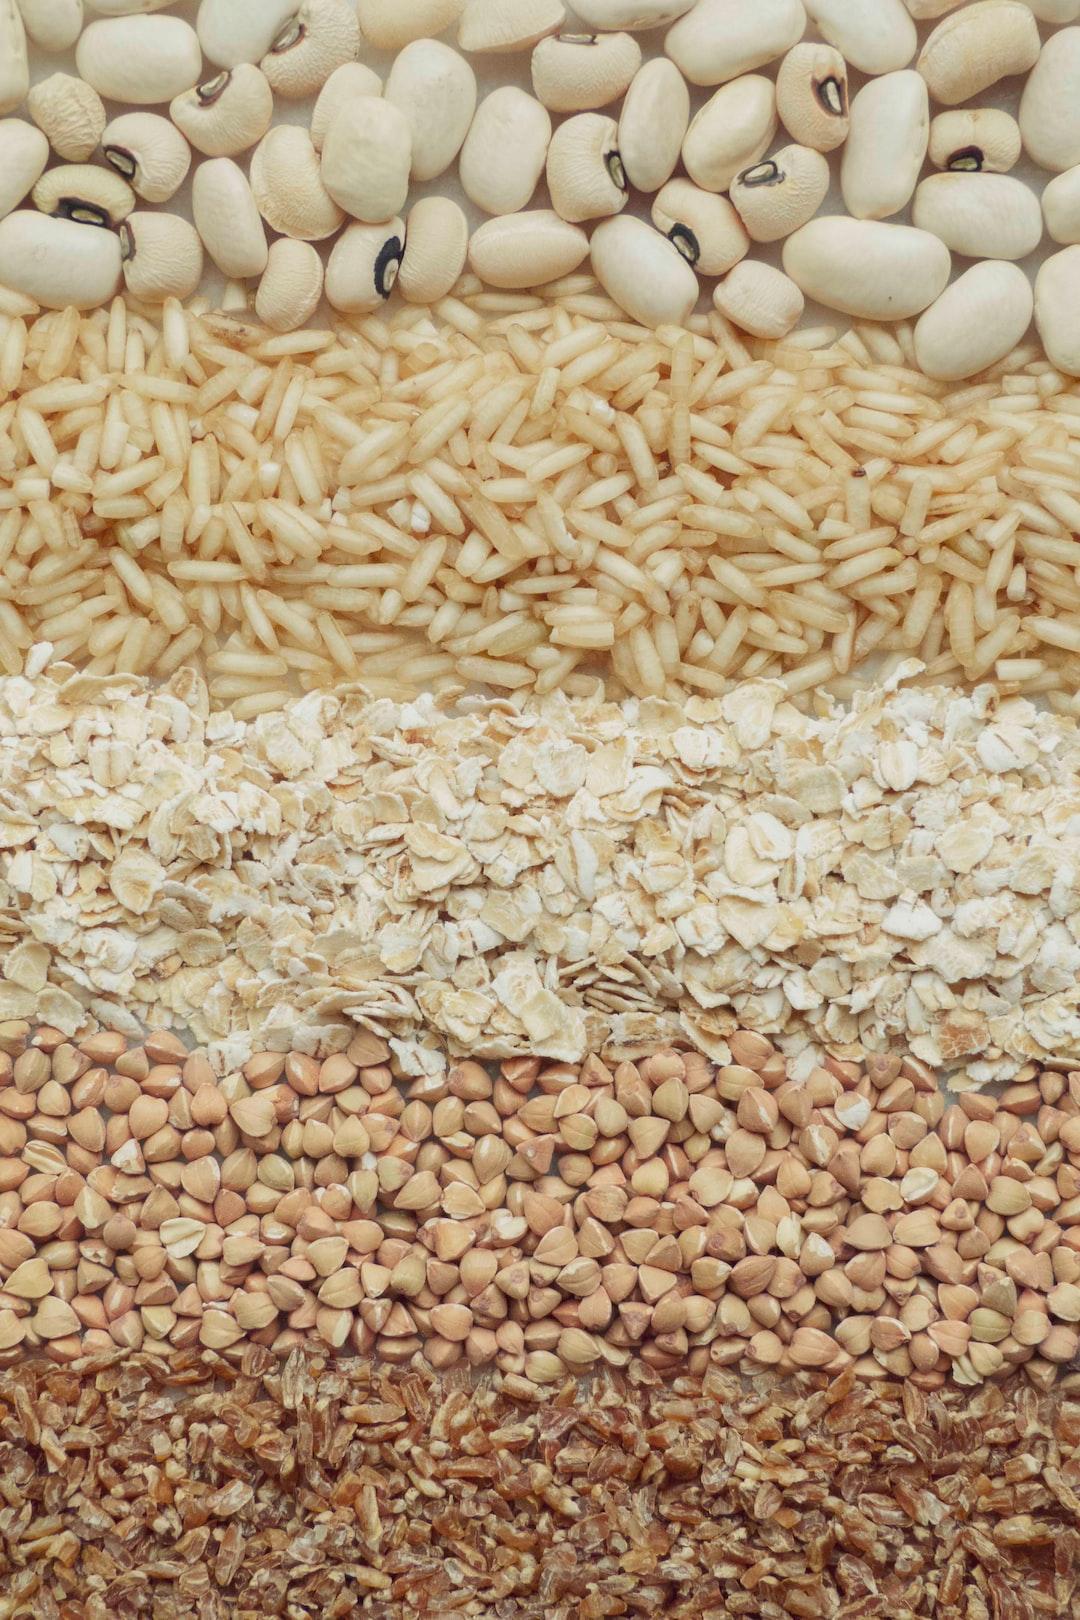 WHOLE FOODS WELLNESS | black eyed peas + white pea beans, brown rice, whole wheat flakes, toasted kasha (buckwheat), brown bulghur